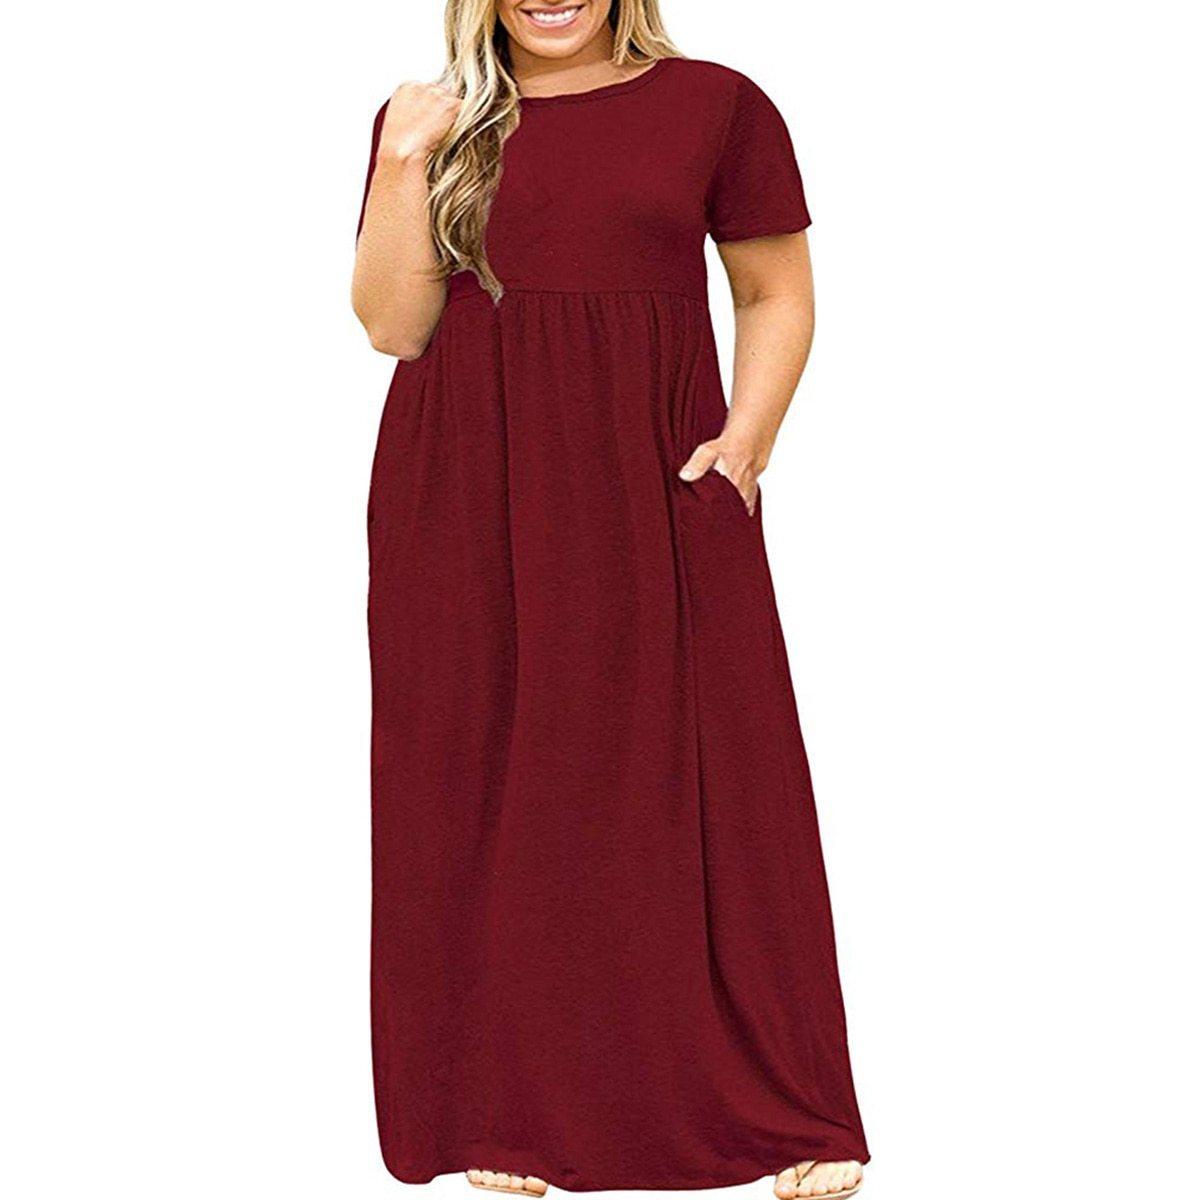 Maternity Dress Solid Color Loose Comfy Mom Dress